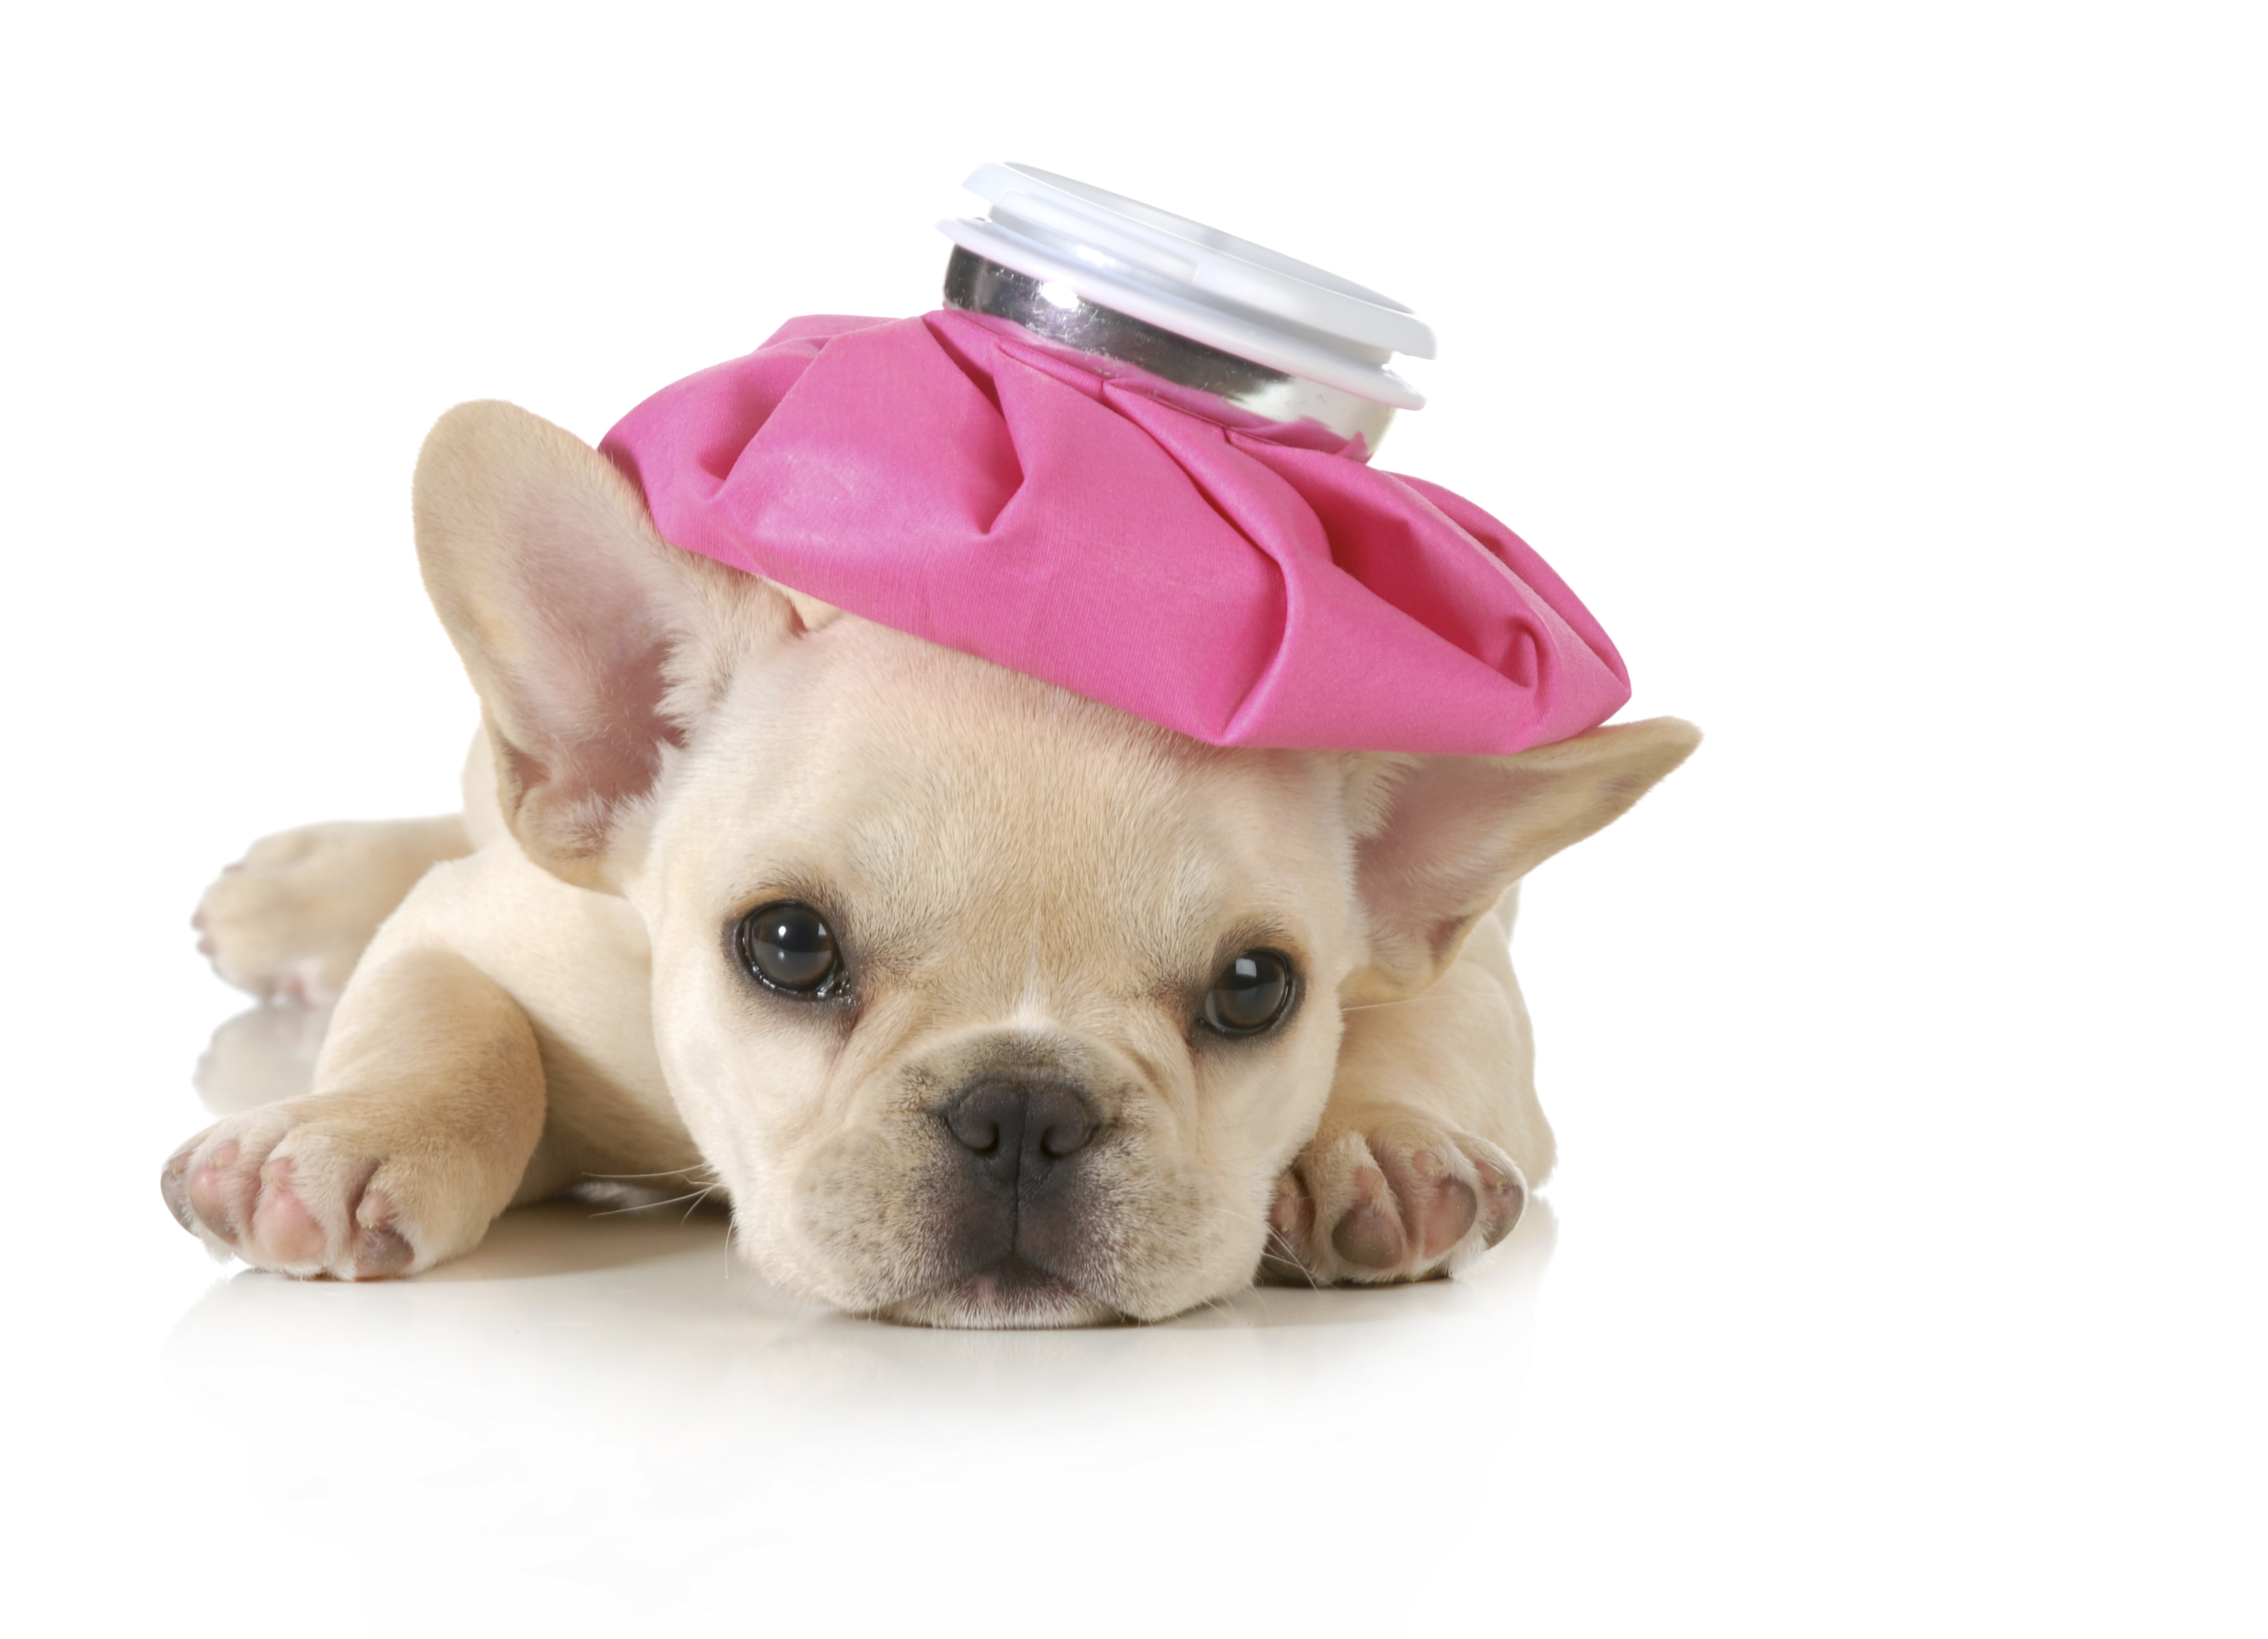 Veterinary Pharmacist